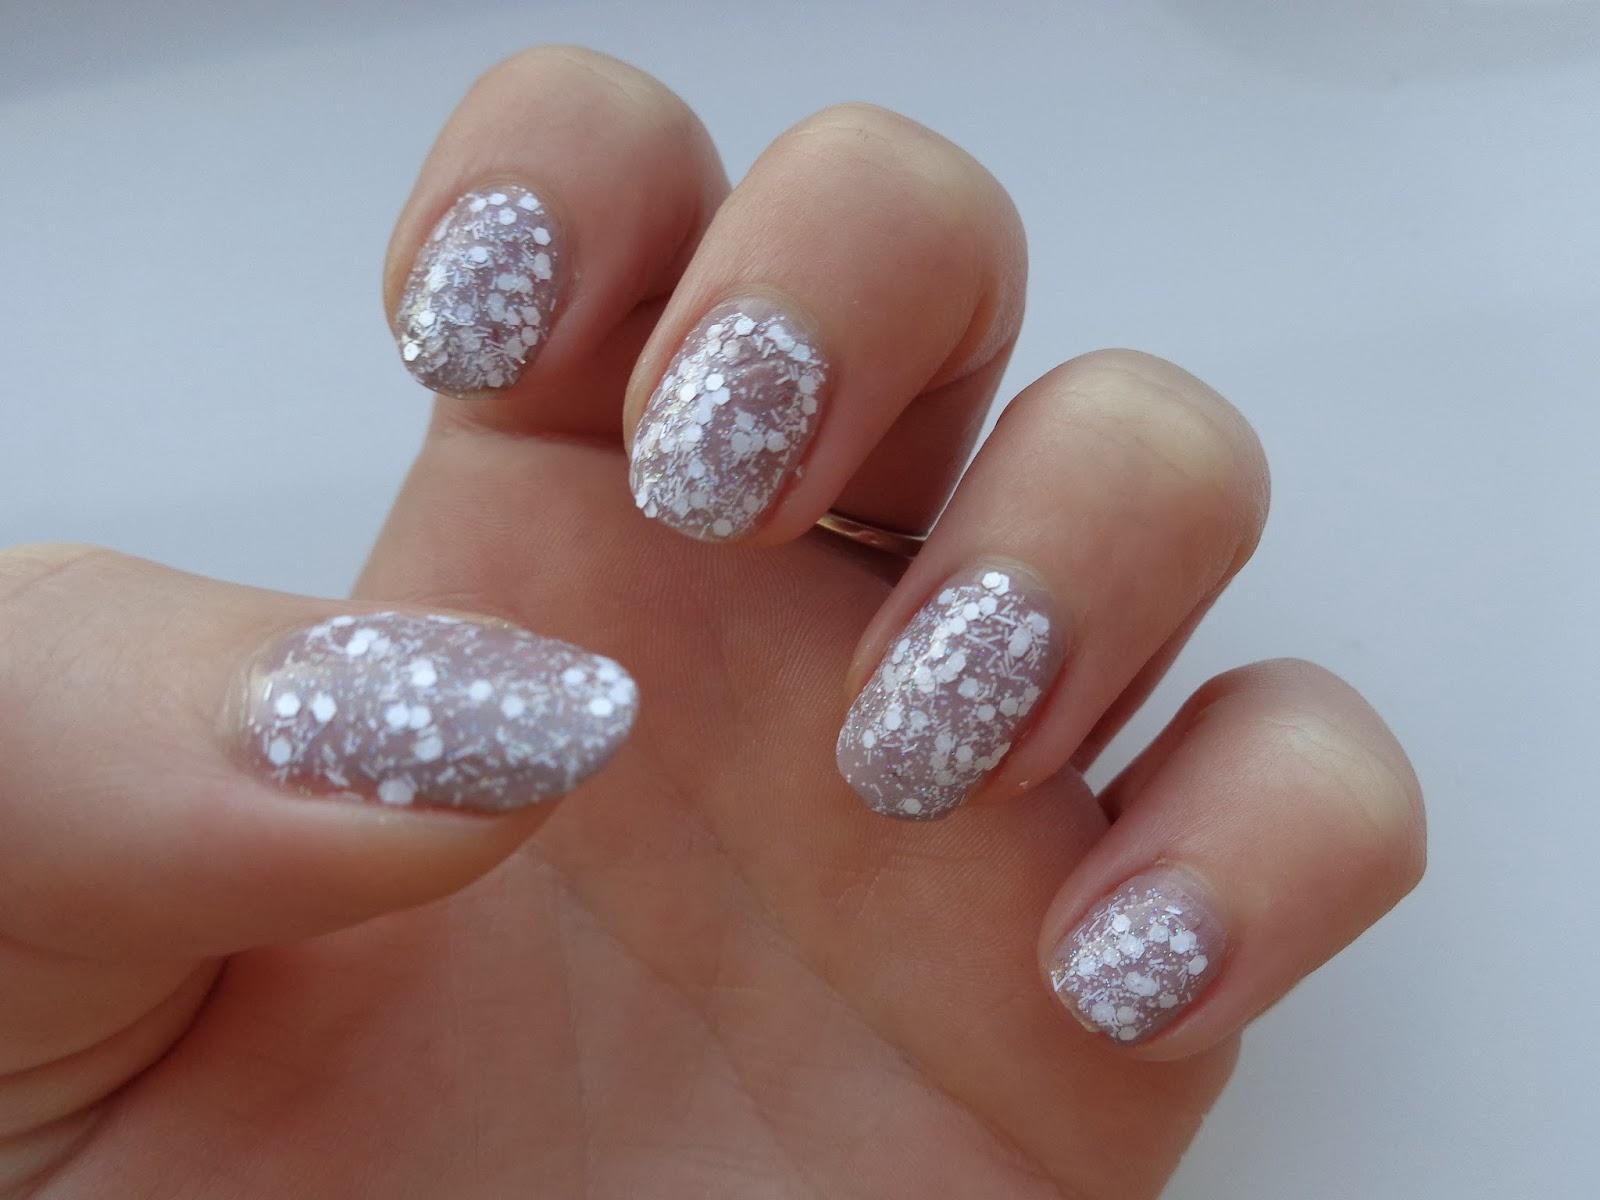 NOTD: Nails Inc Snowflake - Jenna Suth